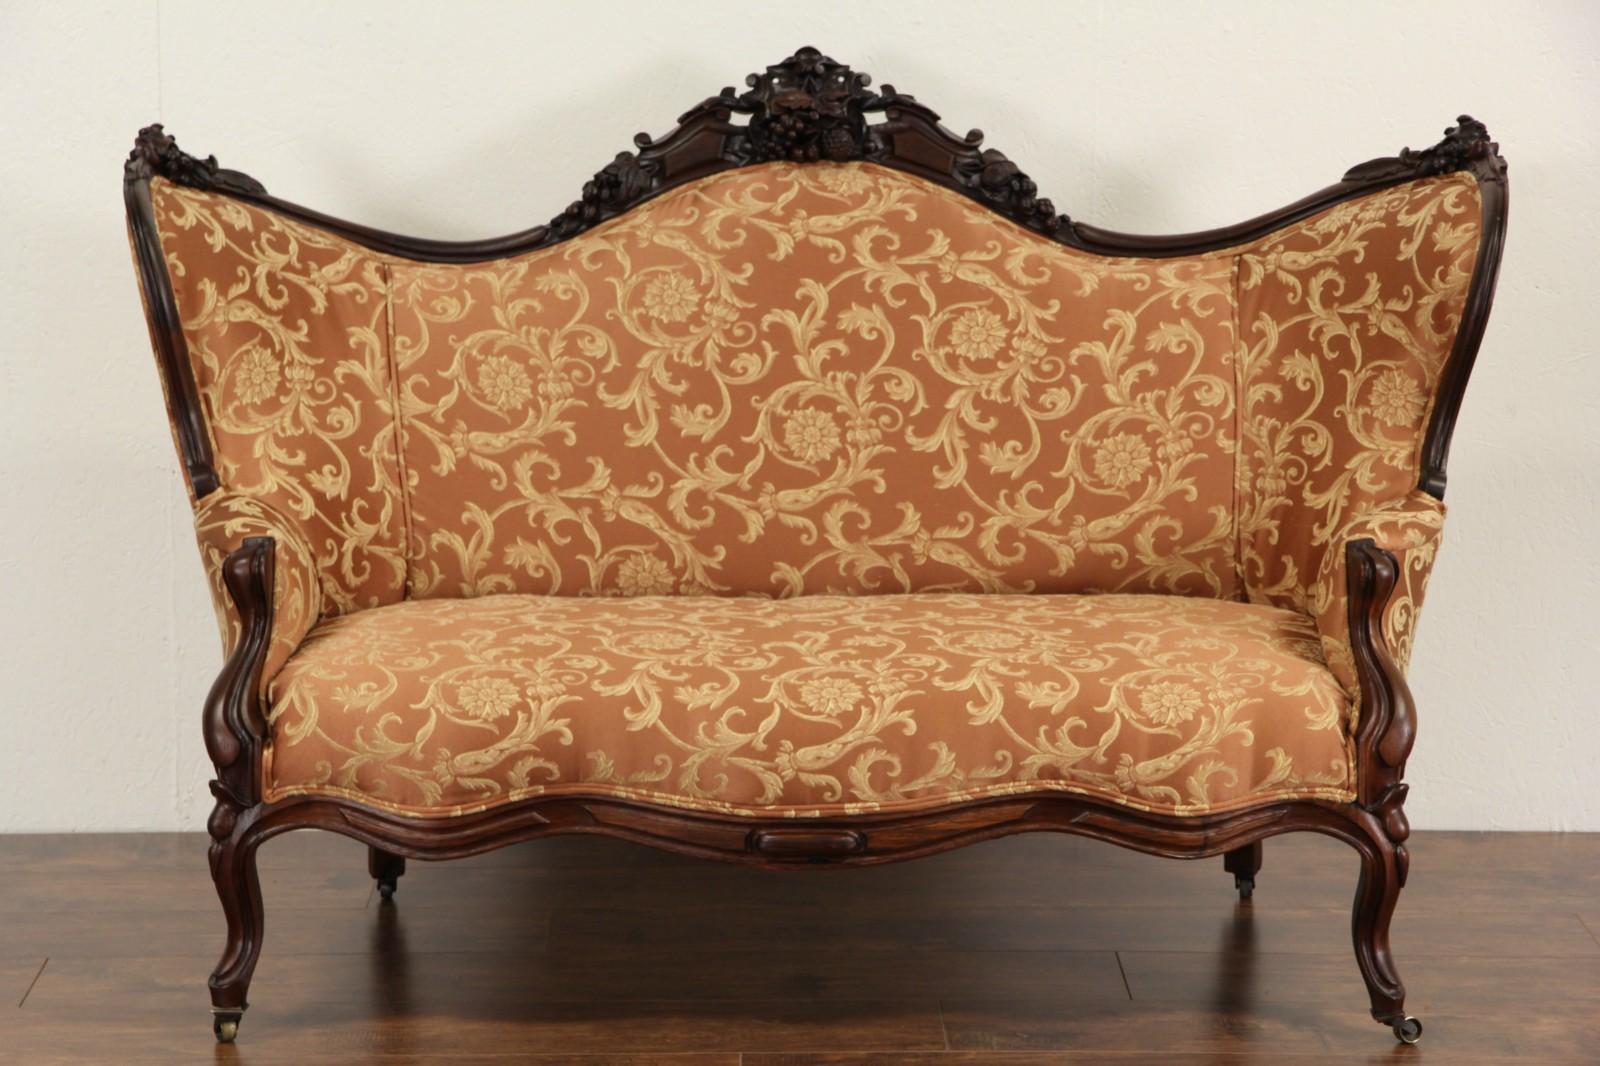 Victorian to Empire Antique 1840 Carved Mahogany Sofa, New